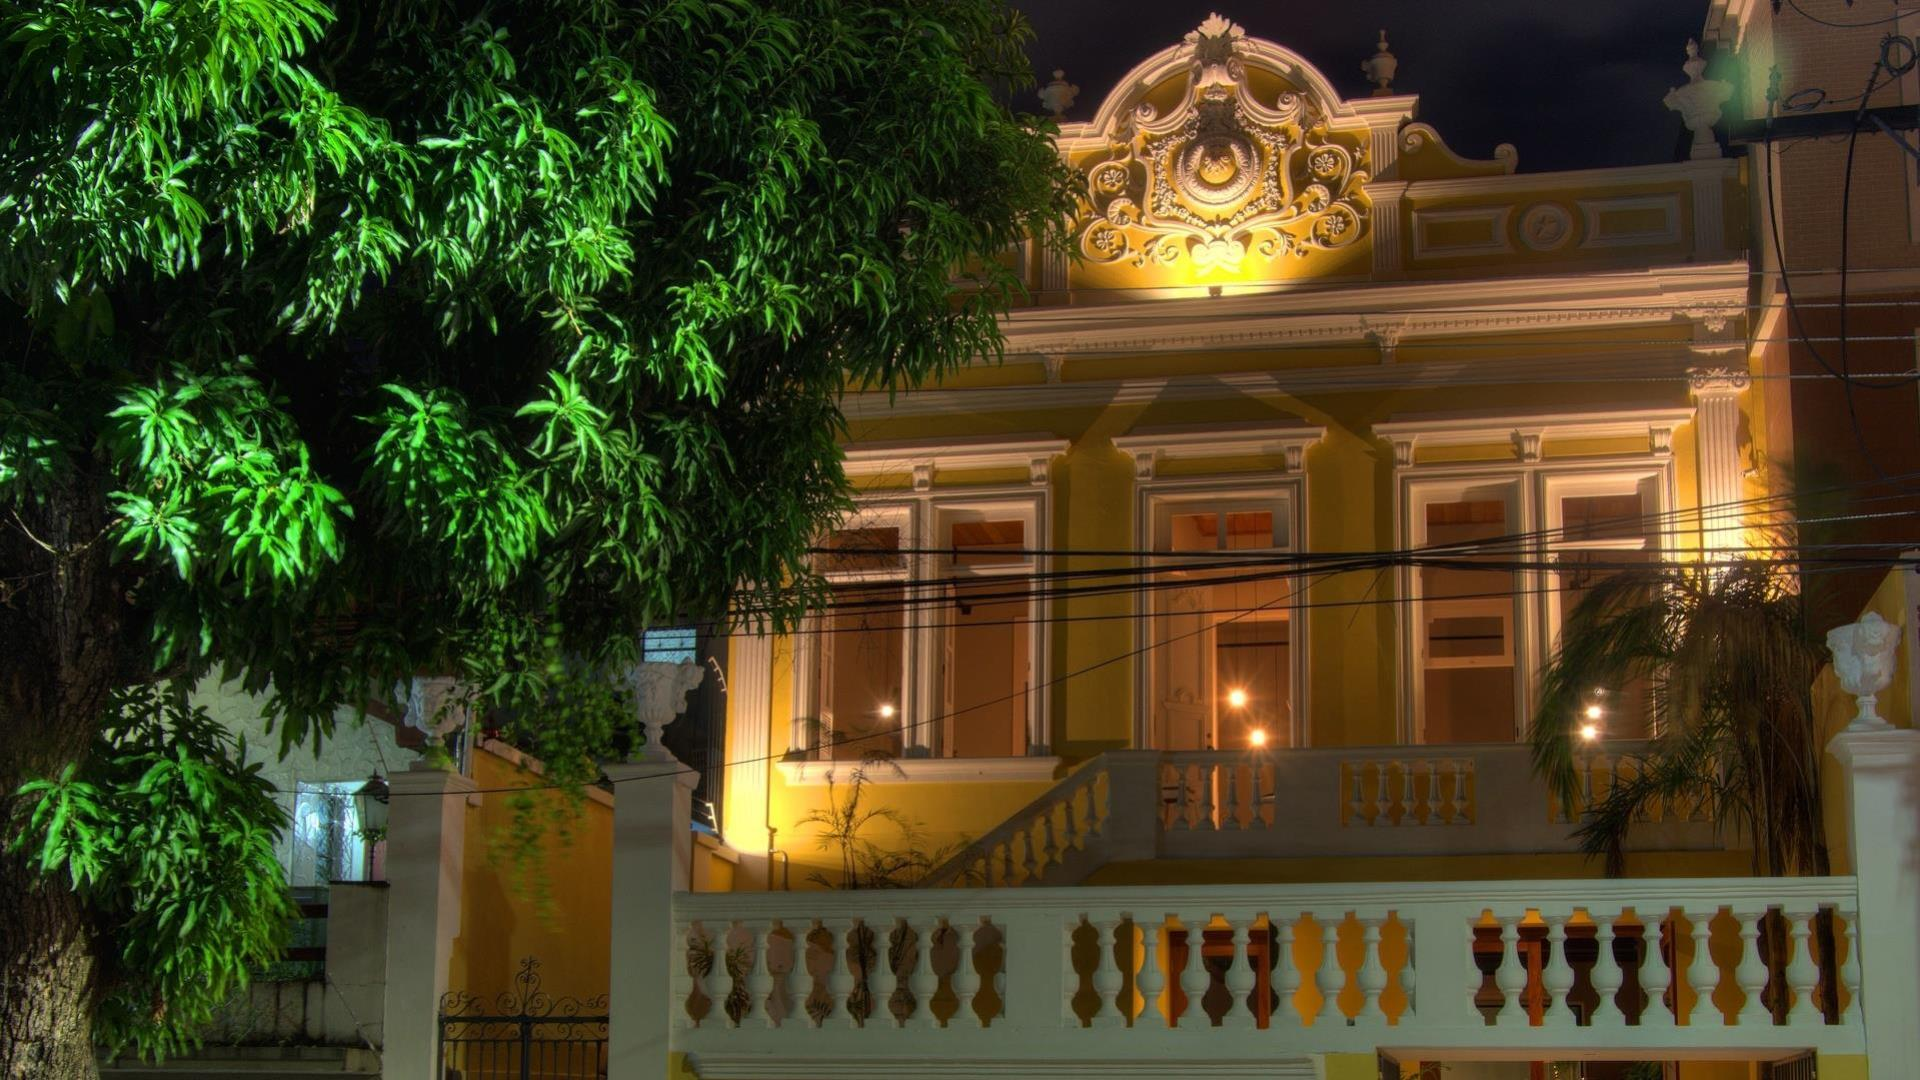 Brazil Manaus: Superior Hotel Villa Amazonia